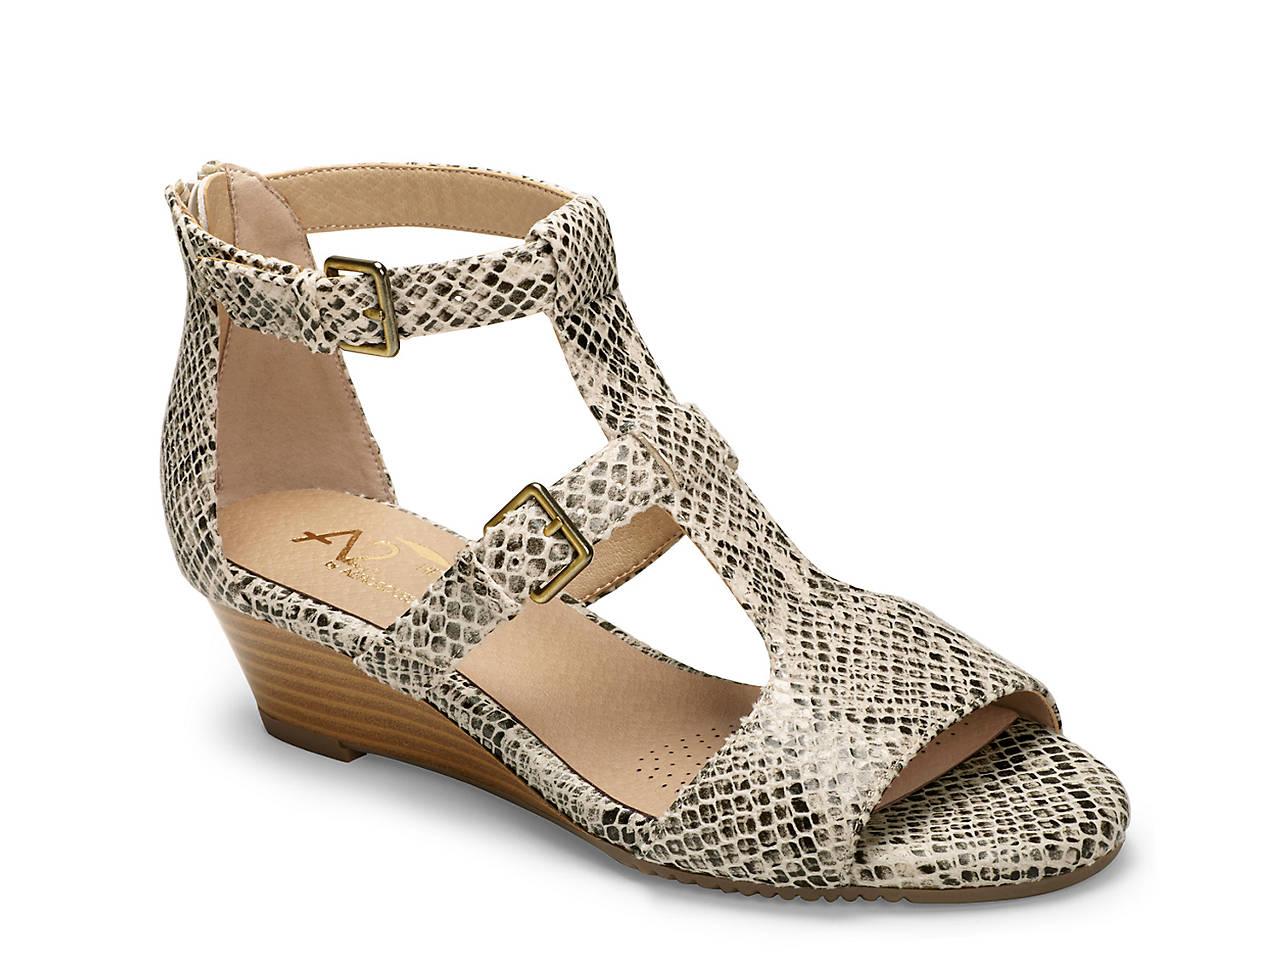 427ebc1d23ac A2 by Aerosoles Applause Wedge Sandal Women s Shoes